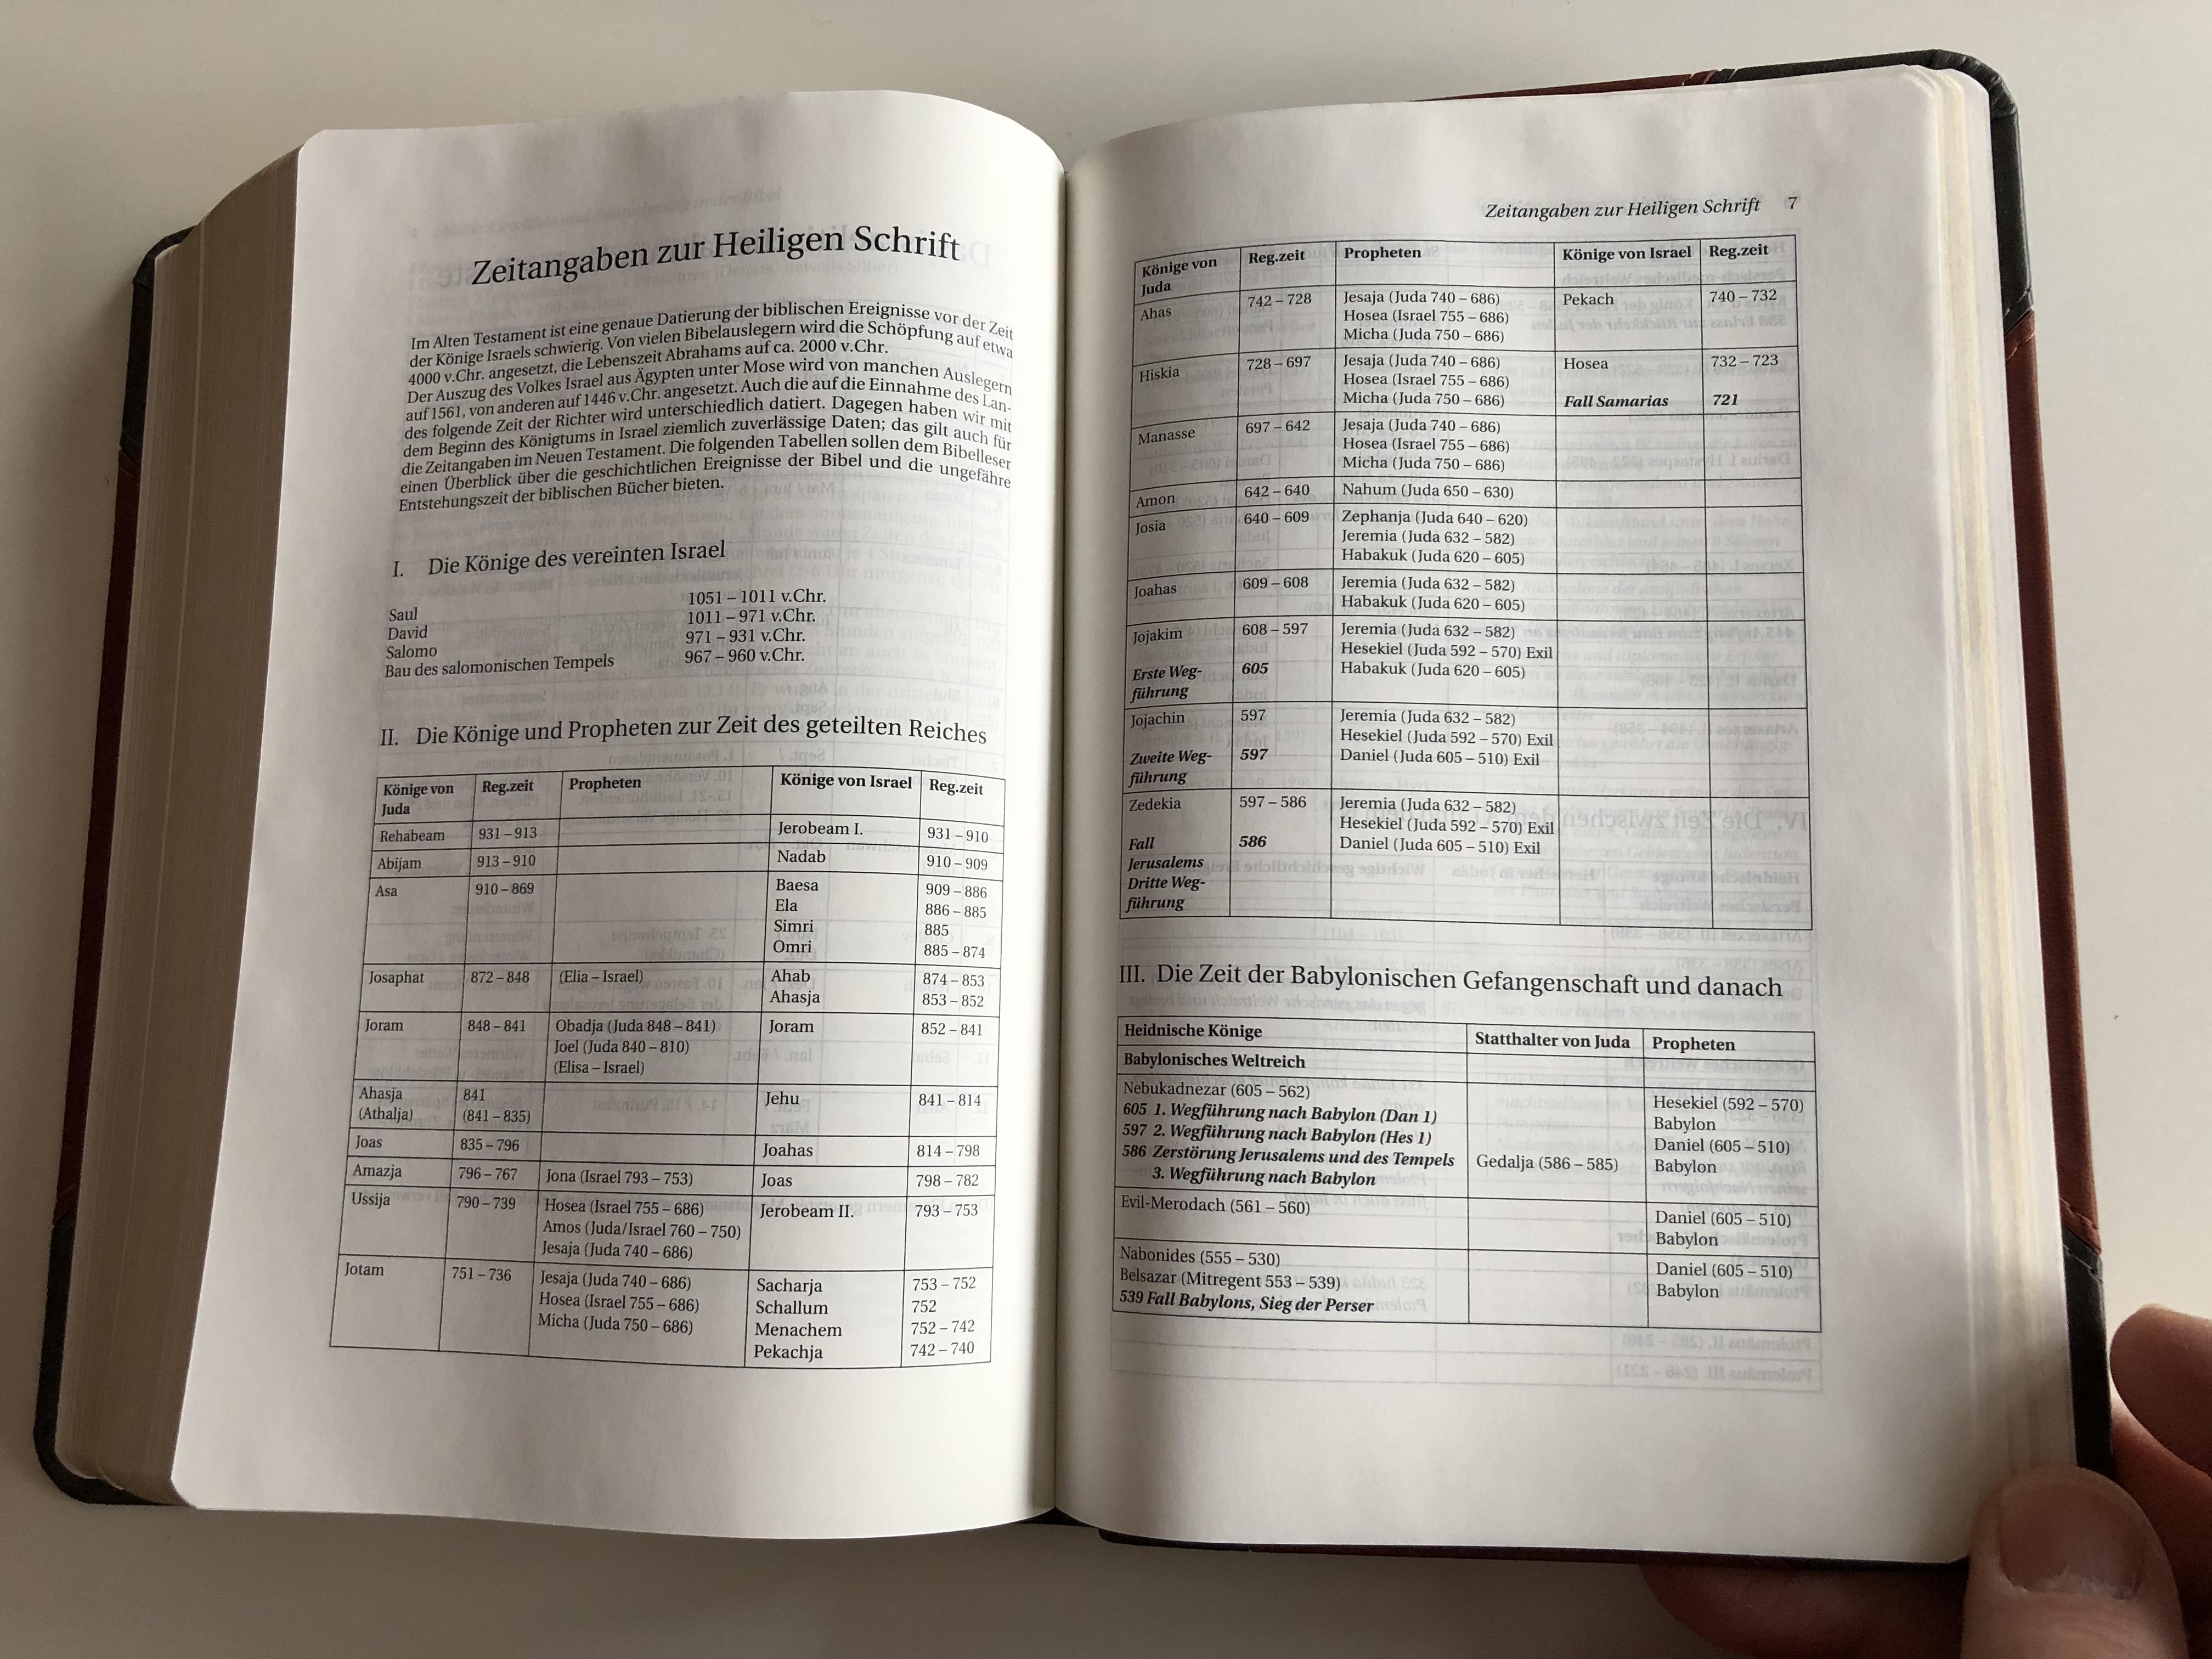 die-bibel-schlachter-version-2000-german-bible-with-parallel-passages-and-study-helps-18.jpg